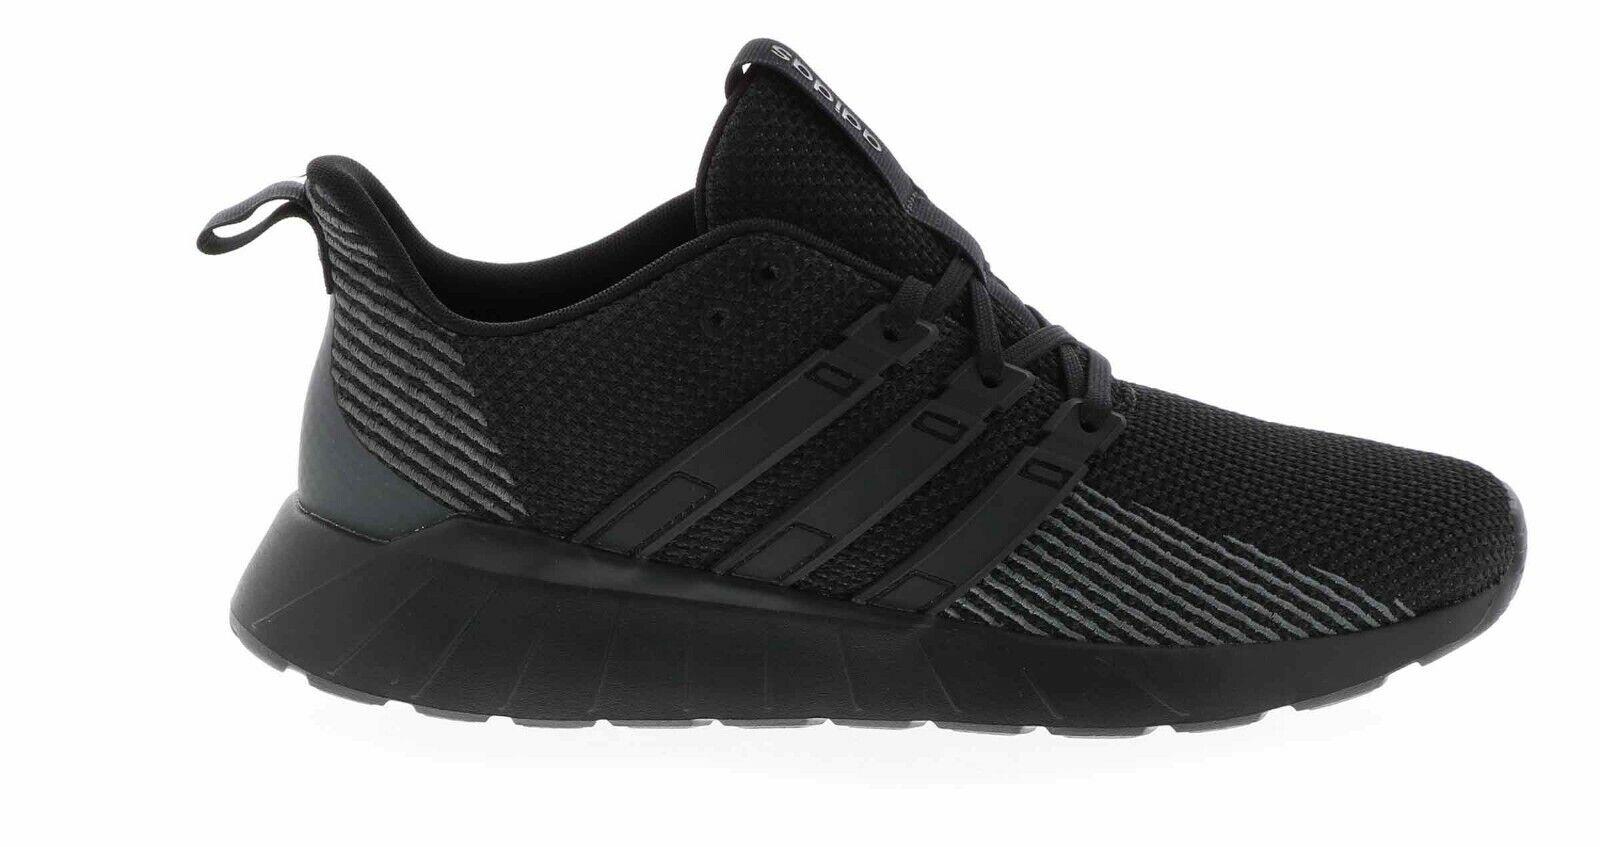 Mens Adidas Questar Flow Black Sport Athletic Running Shoes F36255 Sizes 8-12